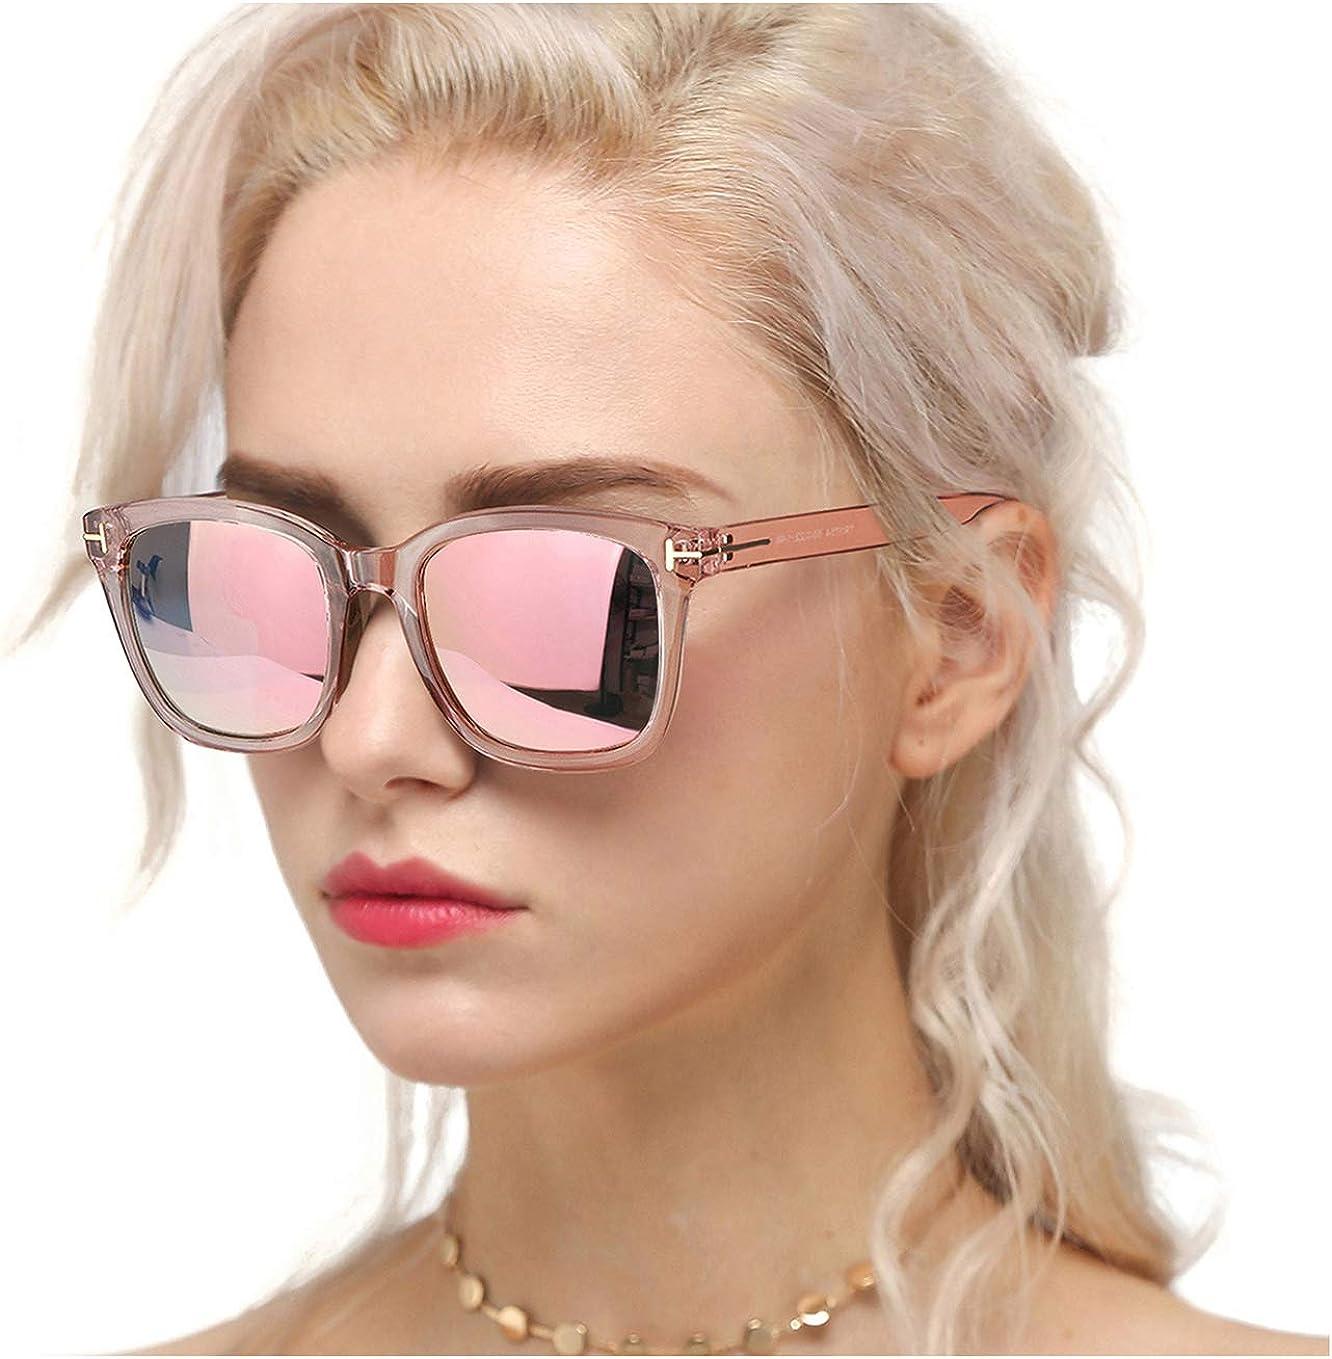 Myiaur Fashion Sunglasses for Women Polarized Driving Anti Glare 100% UV Protection Stylish Design